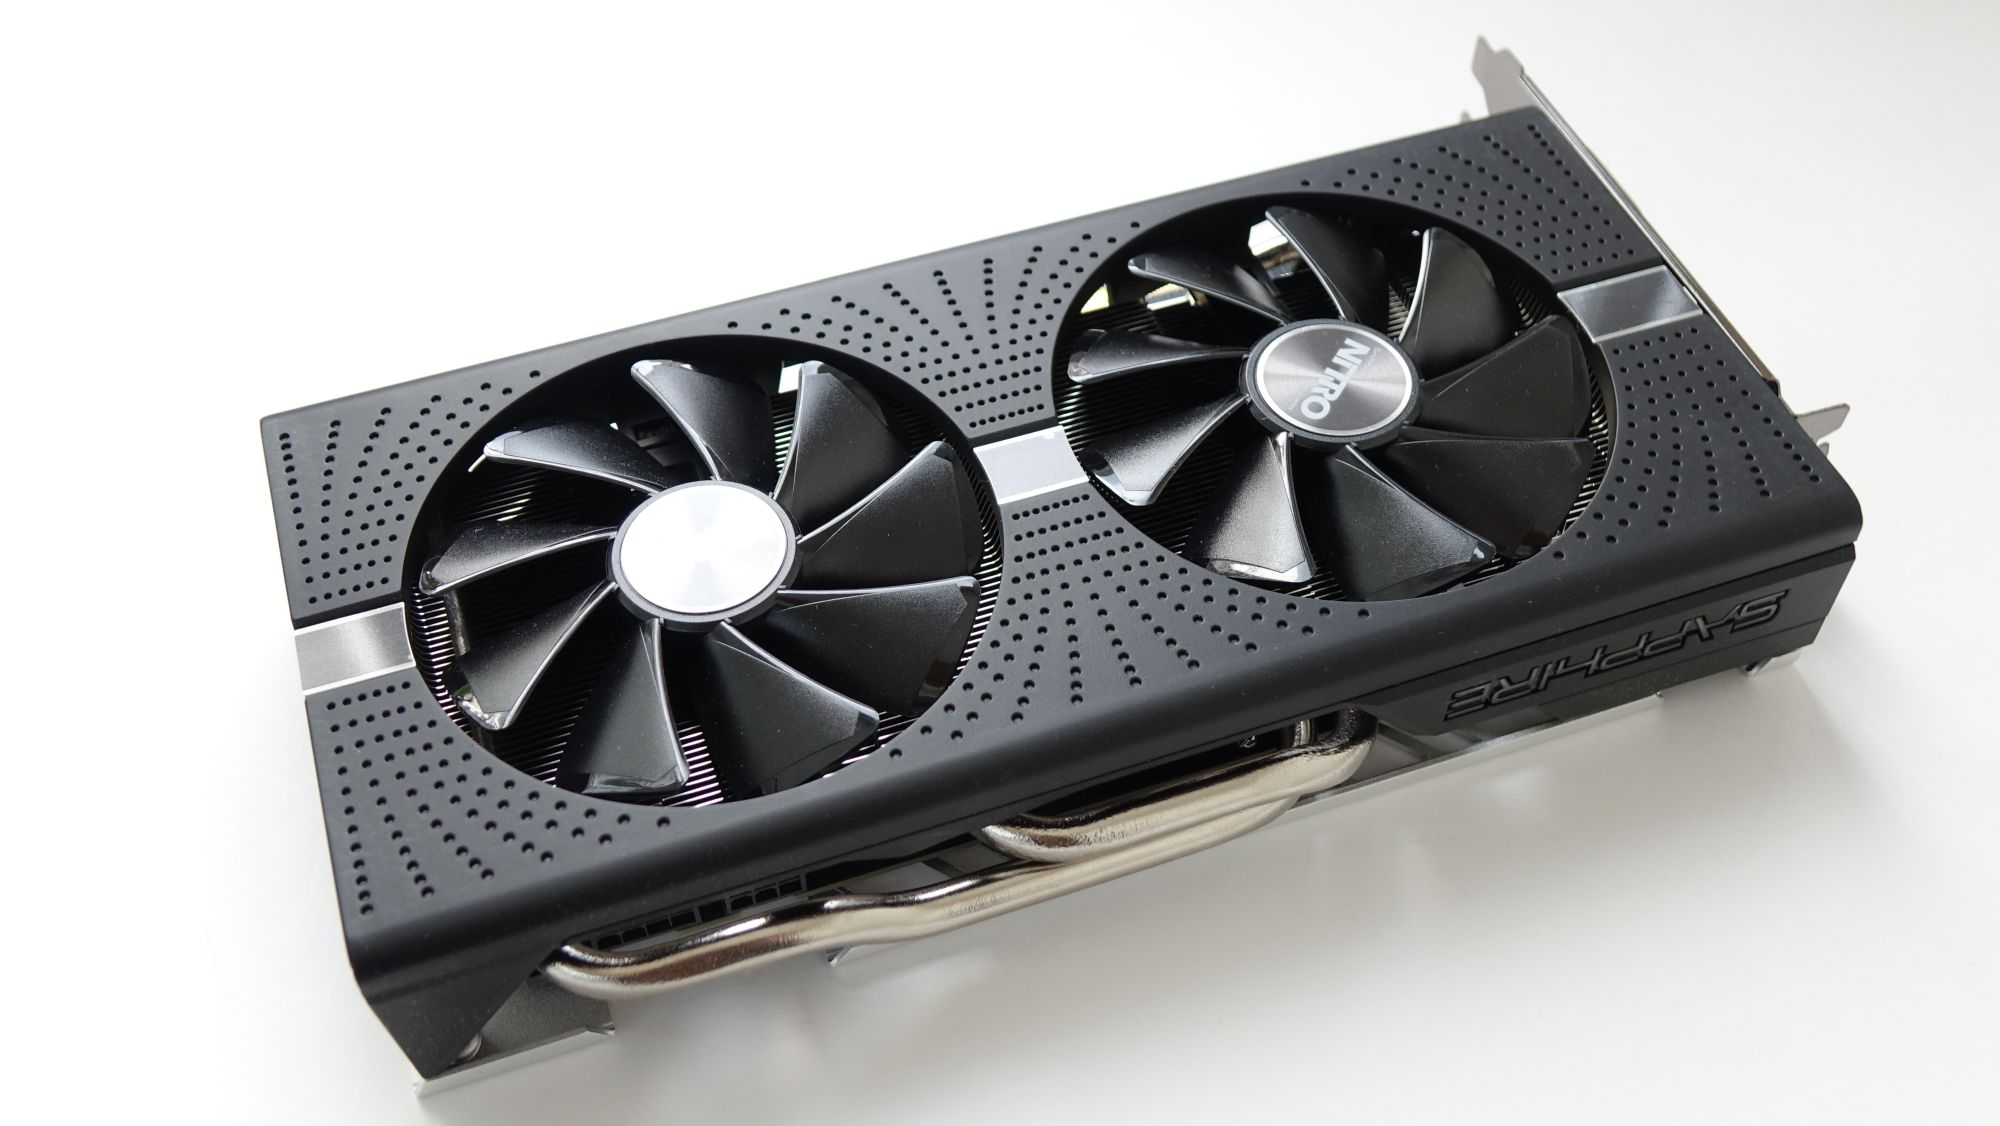 Sapphire Nitro+ RX 590 8G G5 вентиляторы